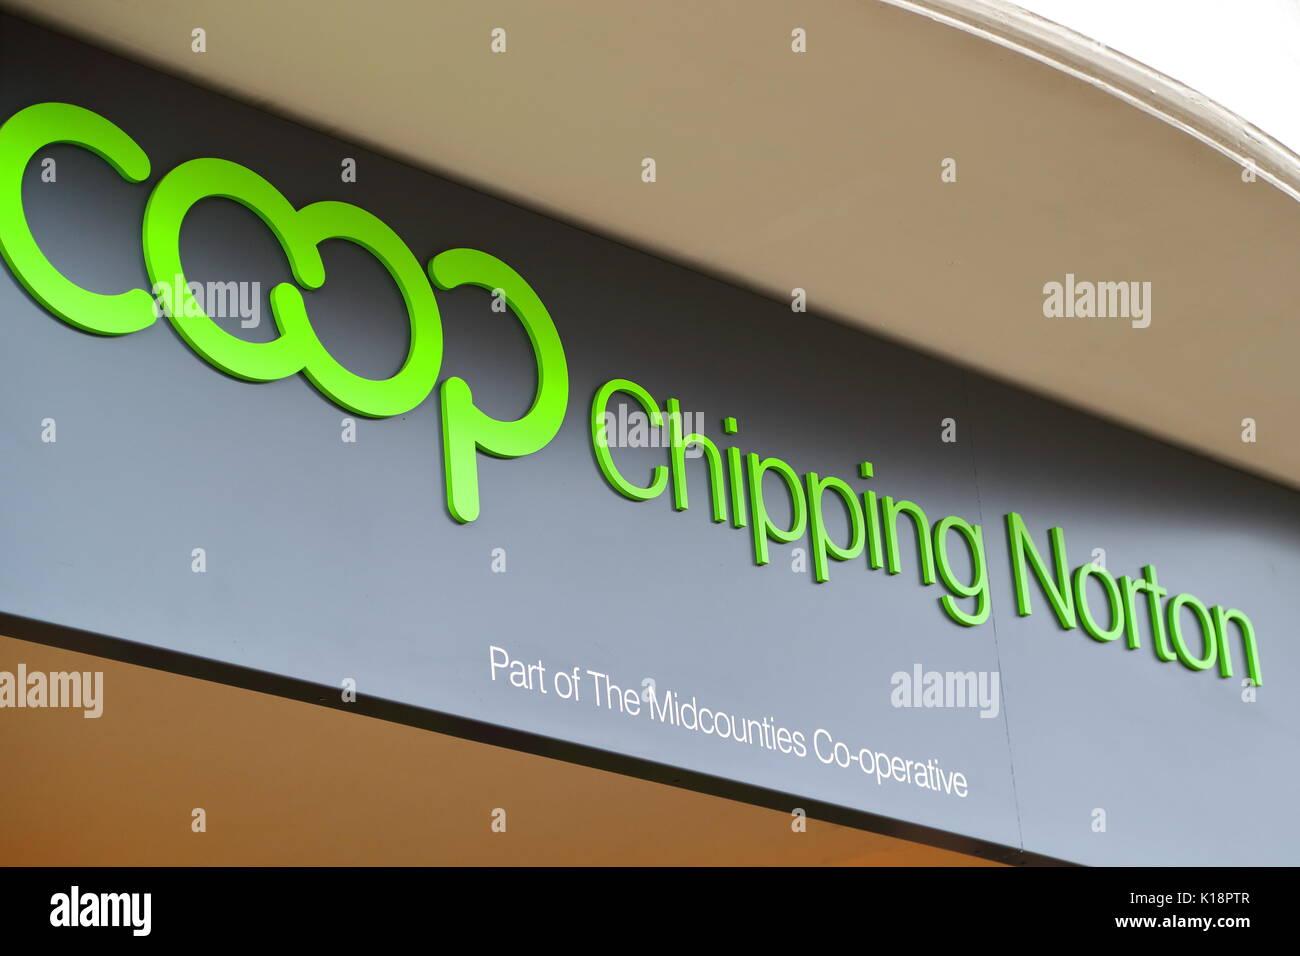 Coop at High Street, Chipping Norton, UK - Stock Image